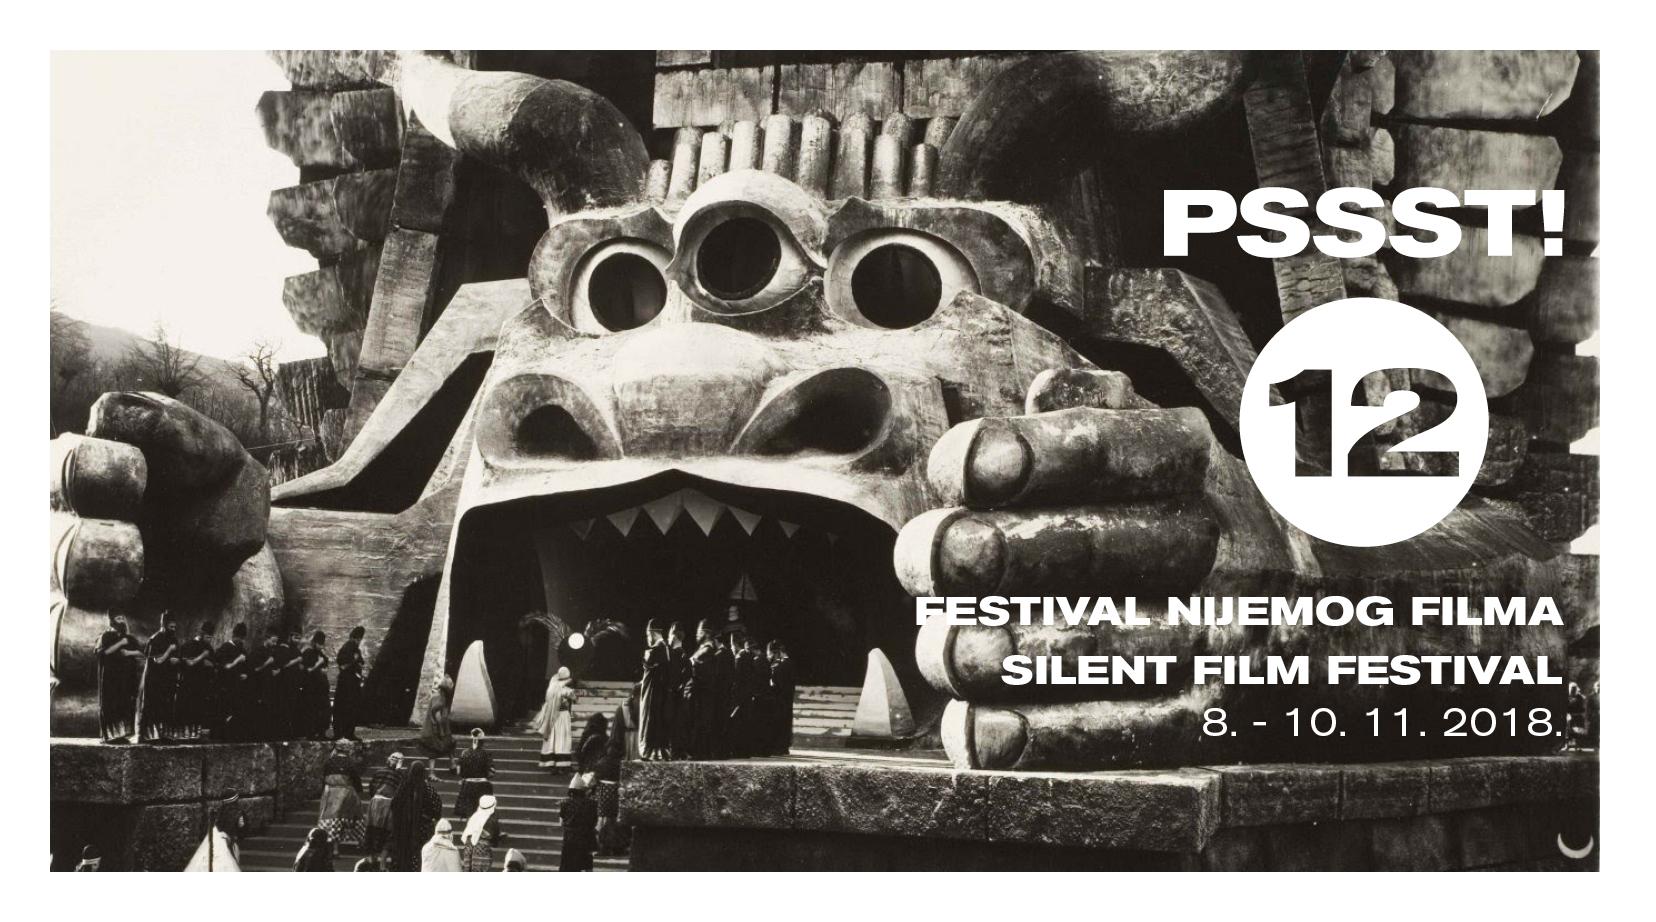 Svečanom dodjelom nagrada završio  12. PSSST! Festival nijemog filma